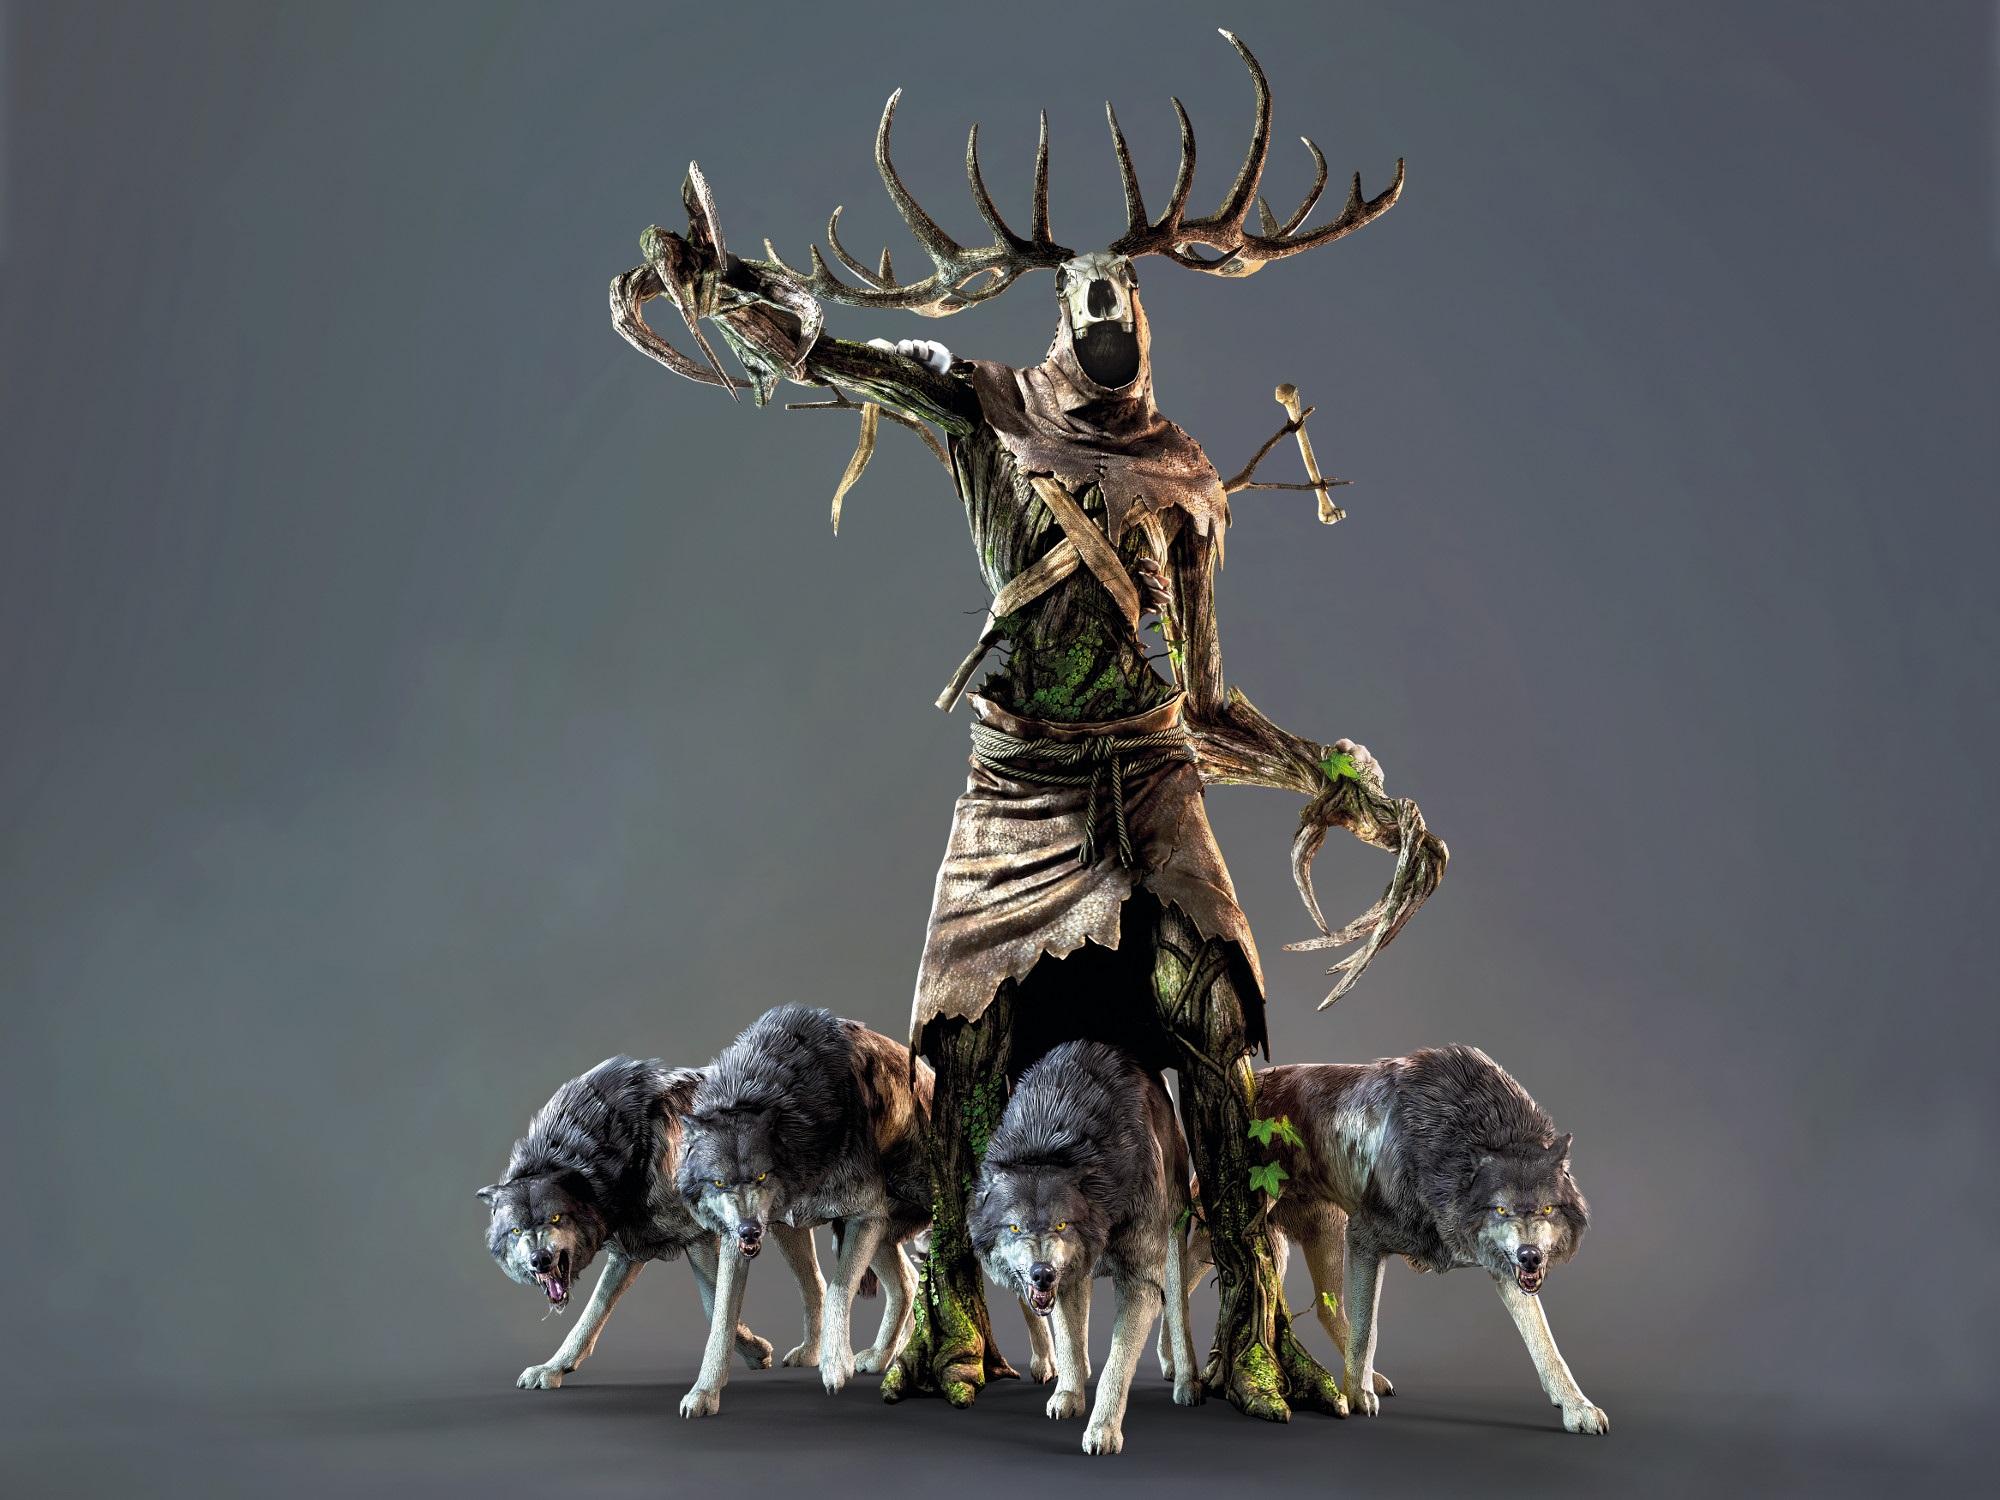 Monstruo Witcher 3